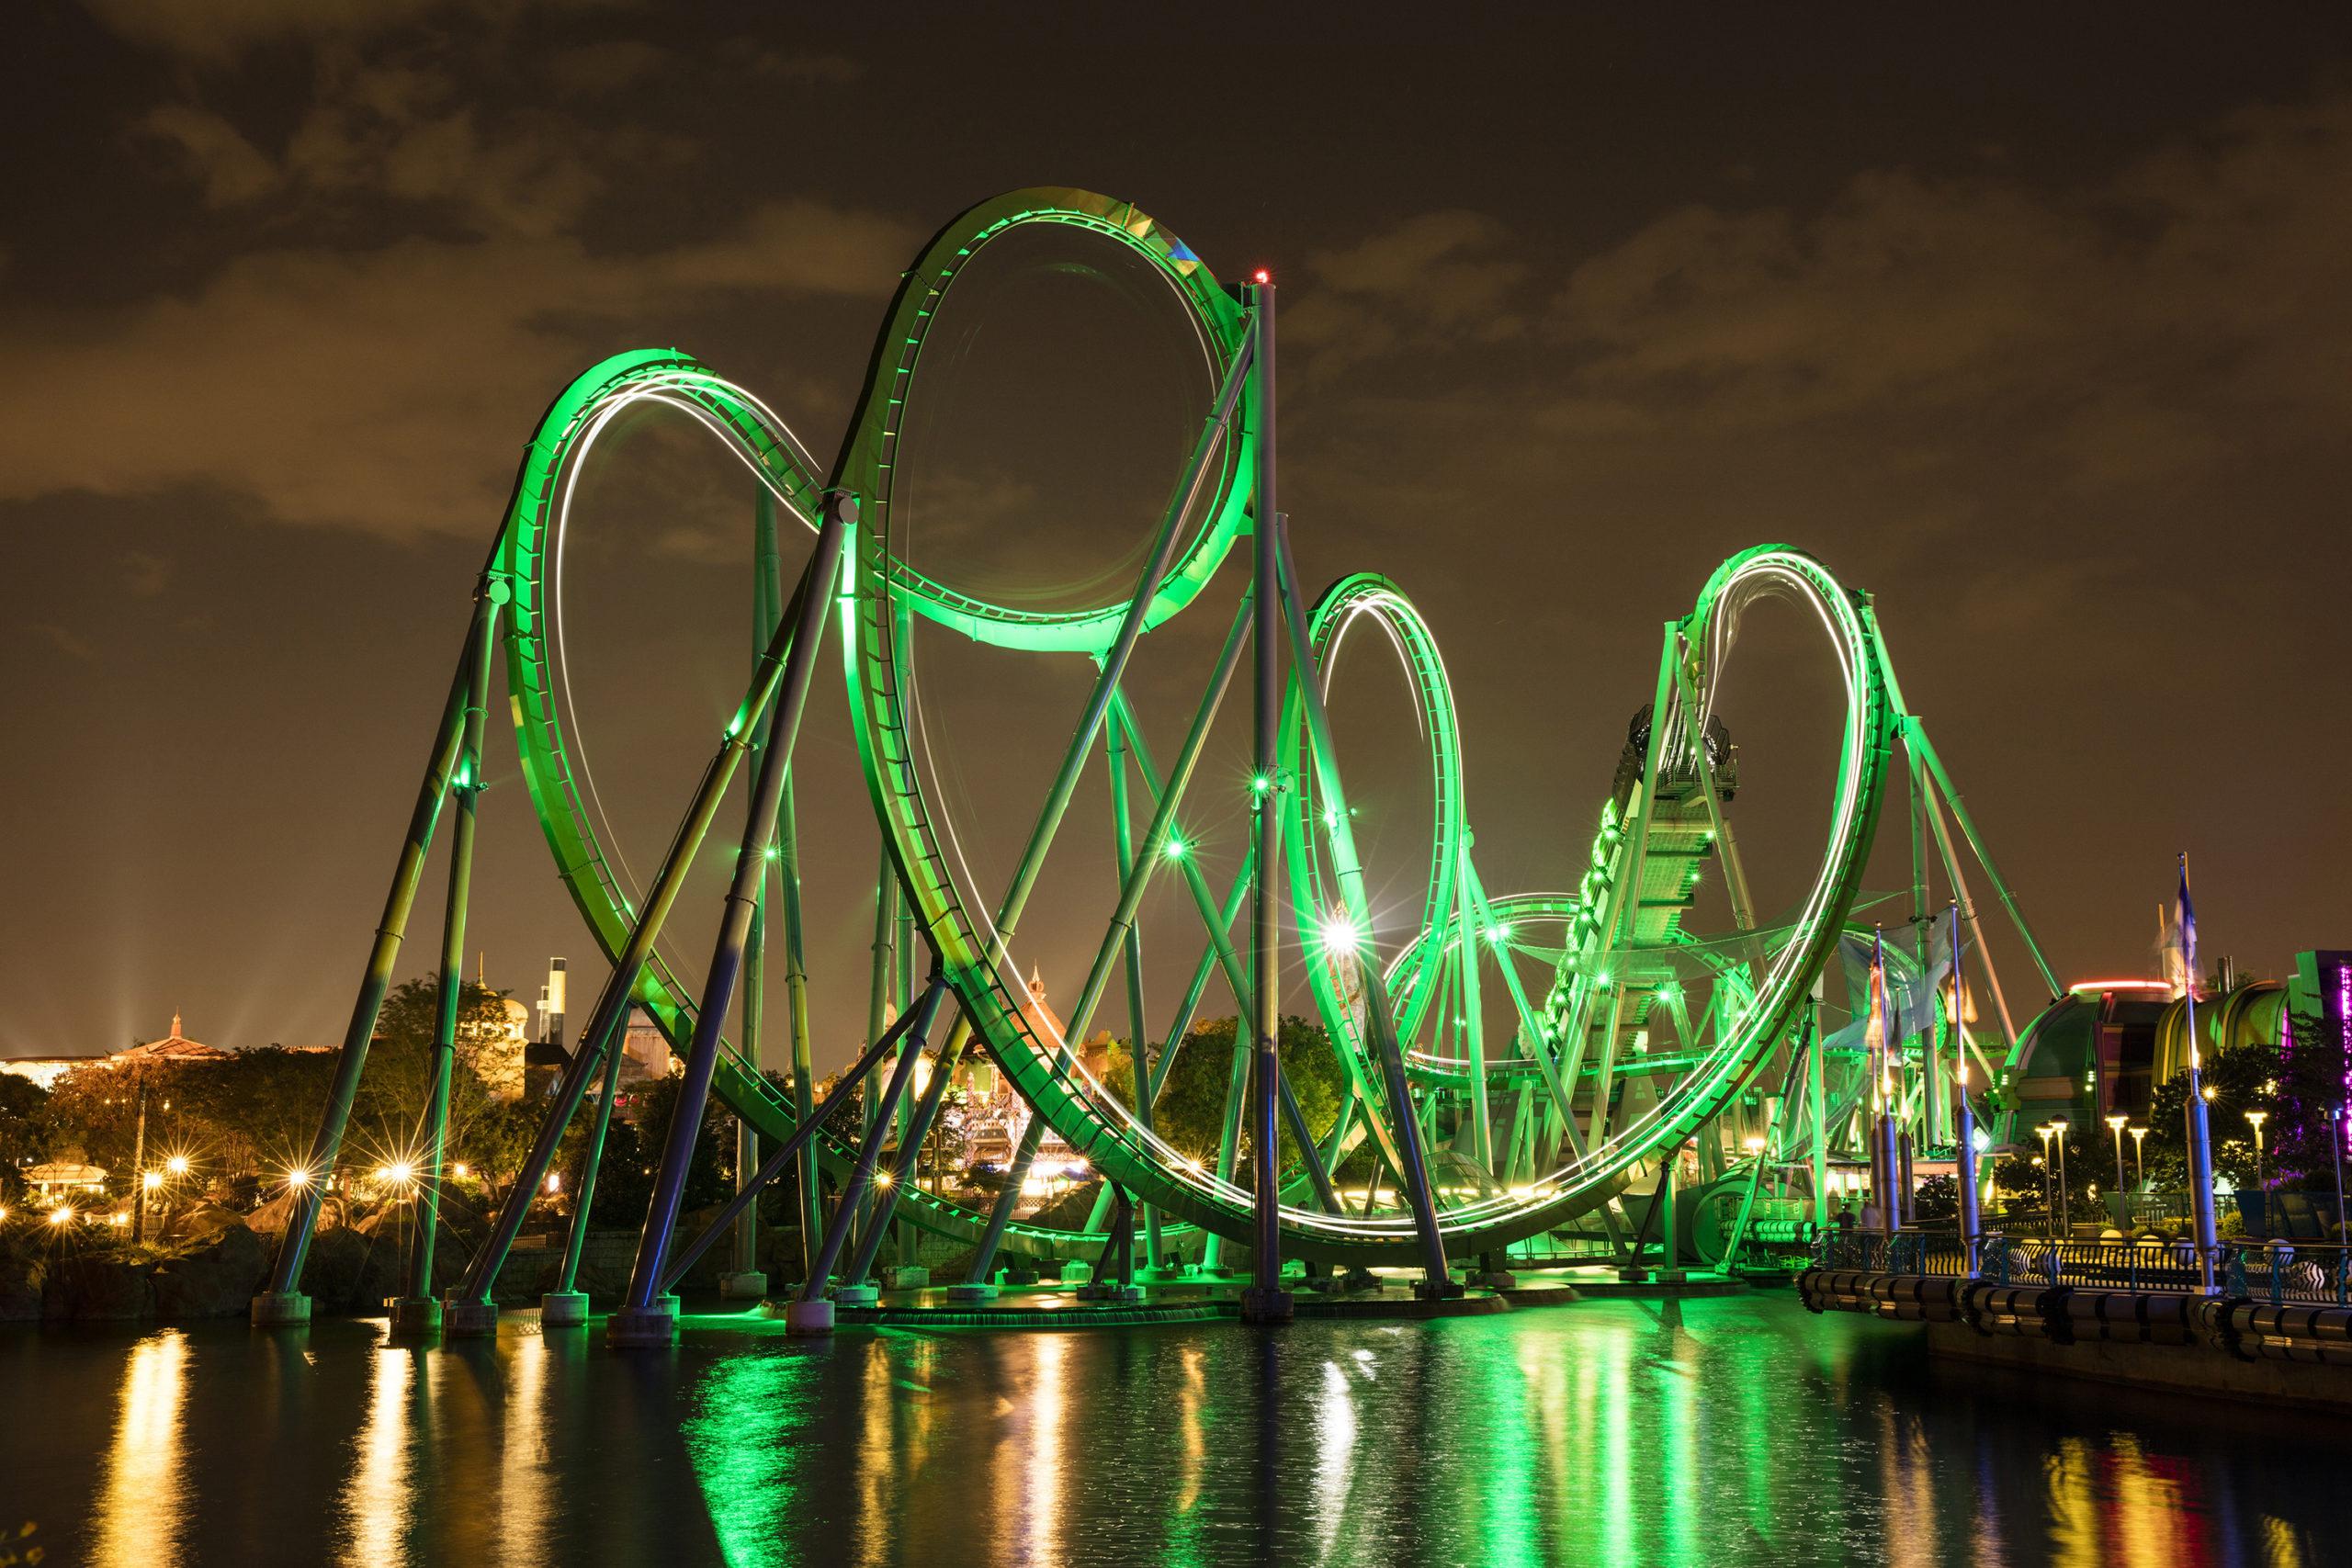 Universal express pass incredible hulk coaster scaled 1